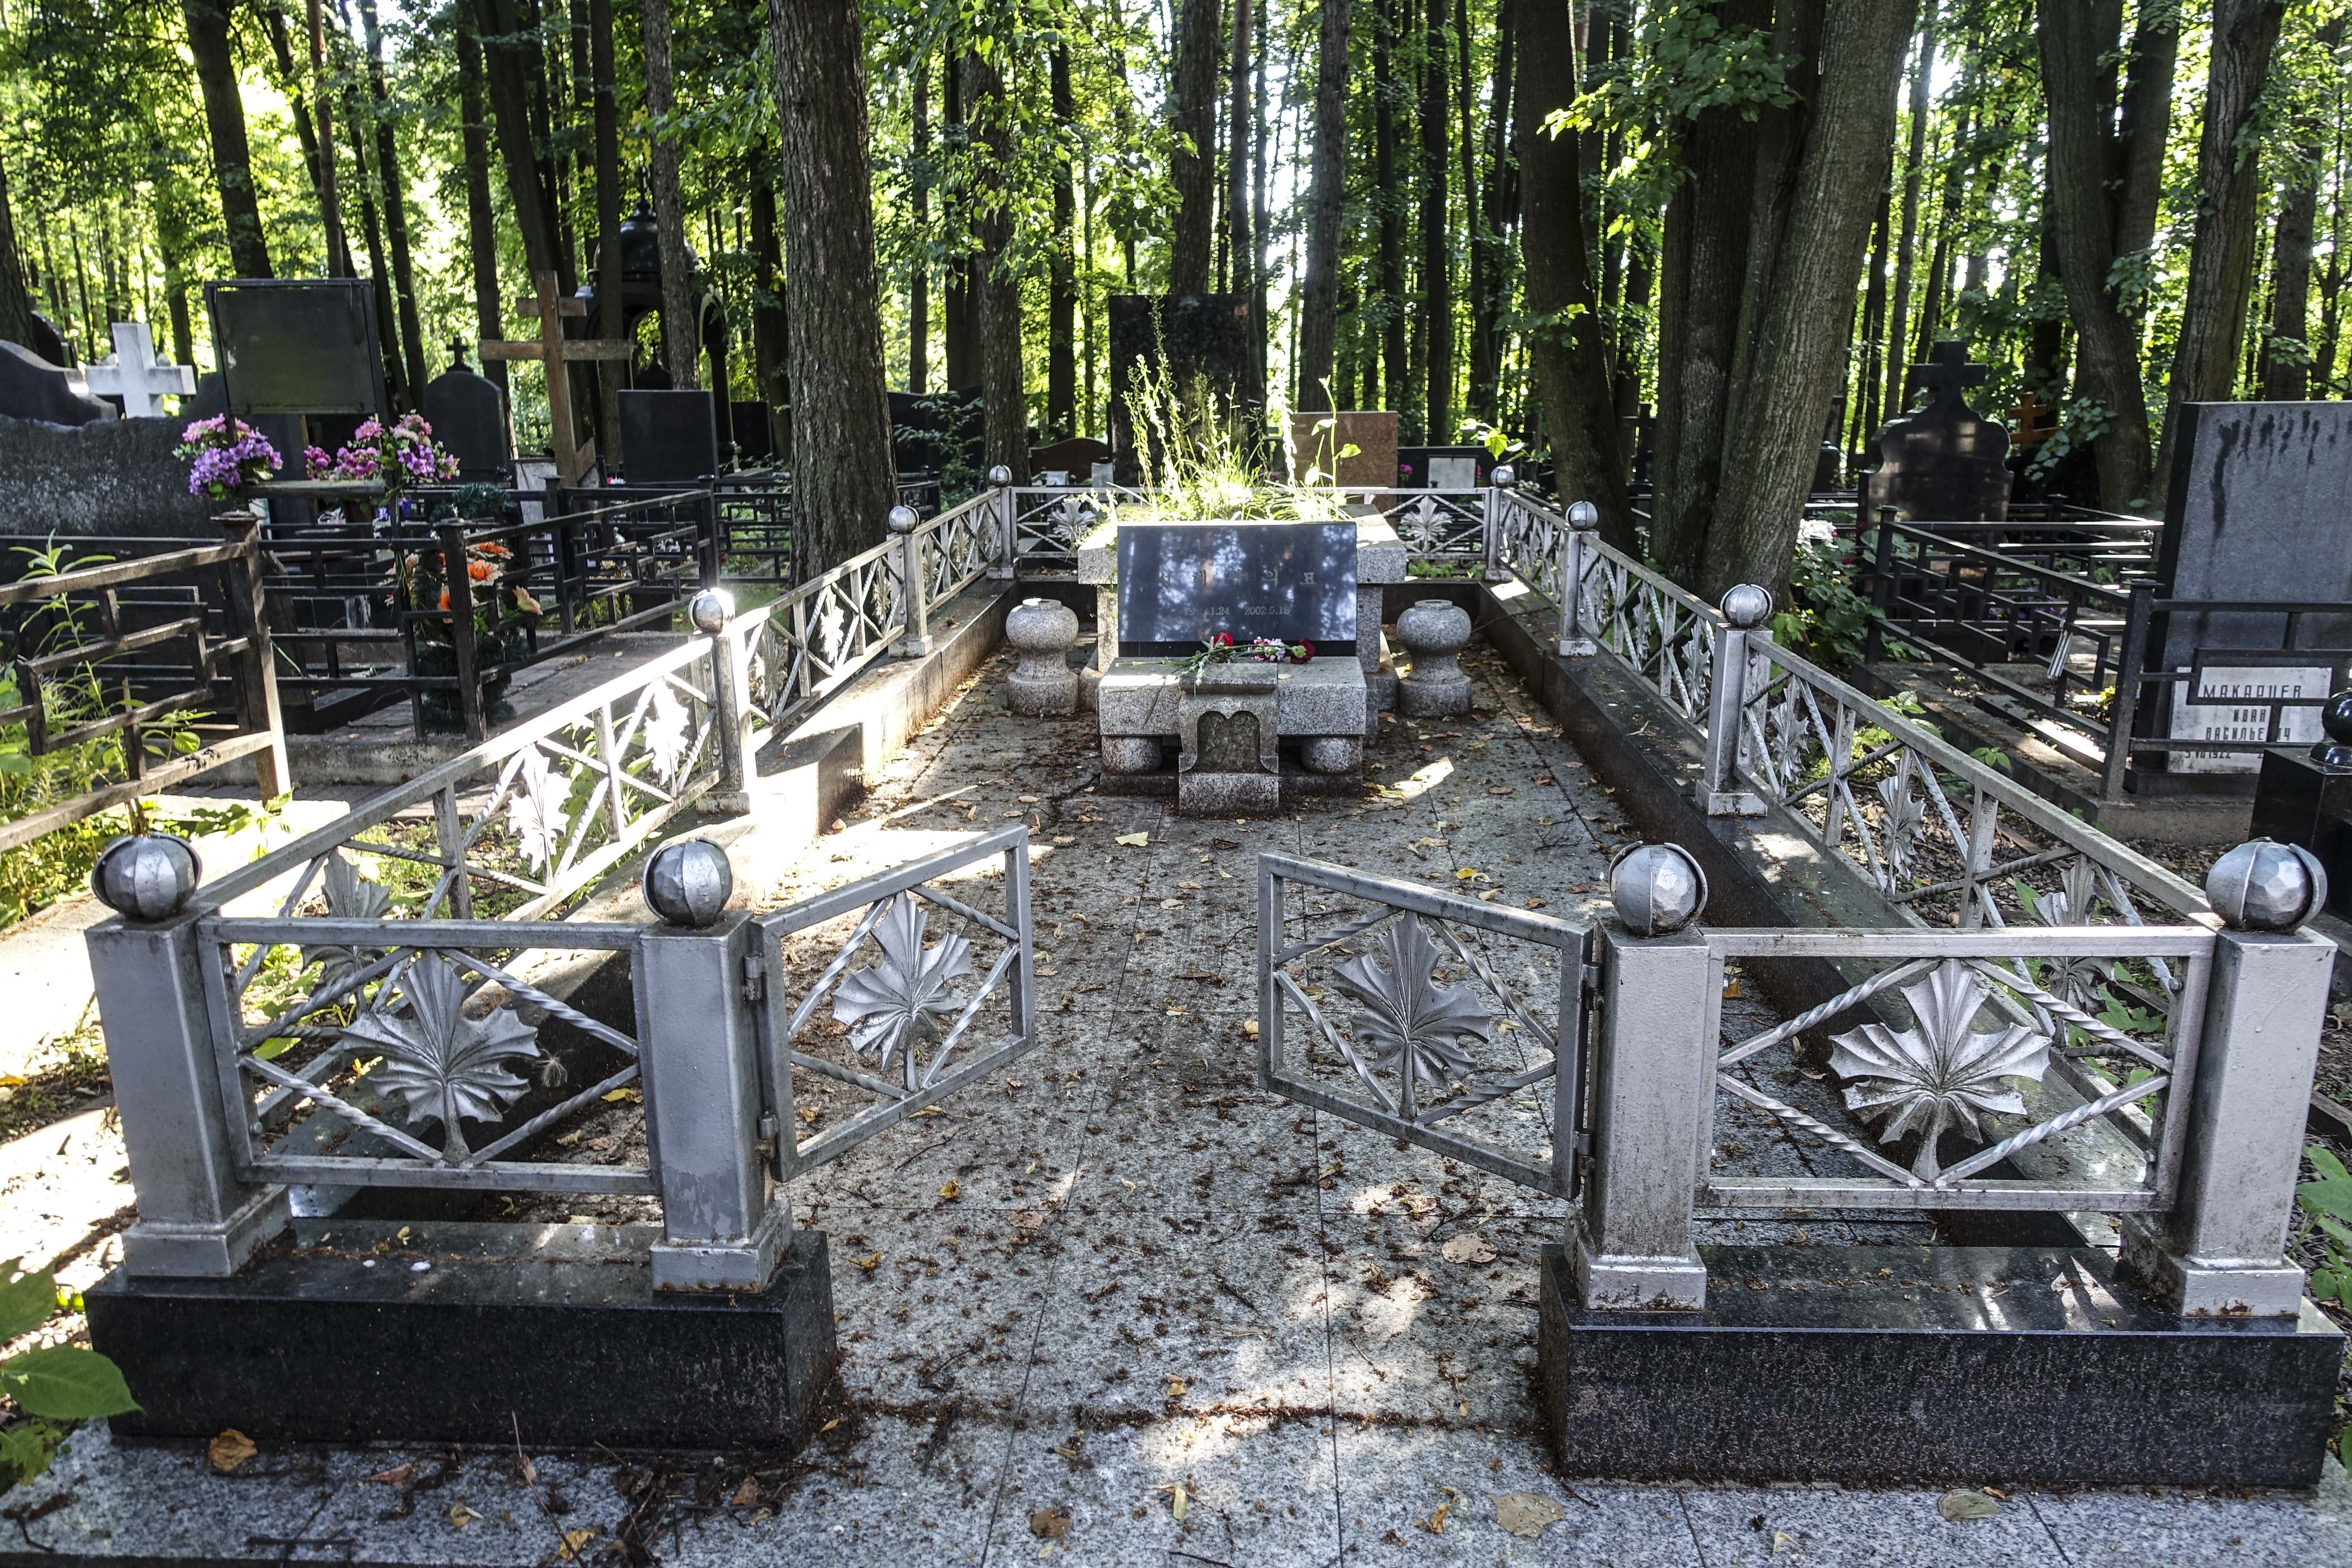 Song Hye-rim's grave at Moscow's Troyekurovskoye cemetery / Oleg Kiryanov